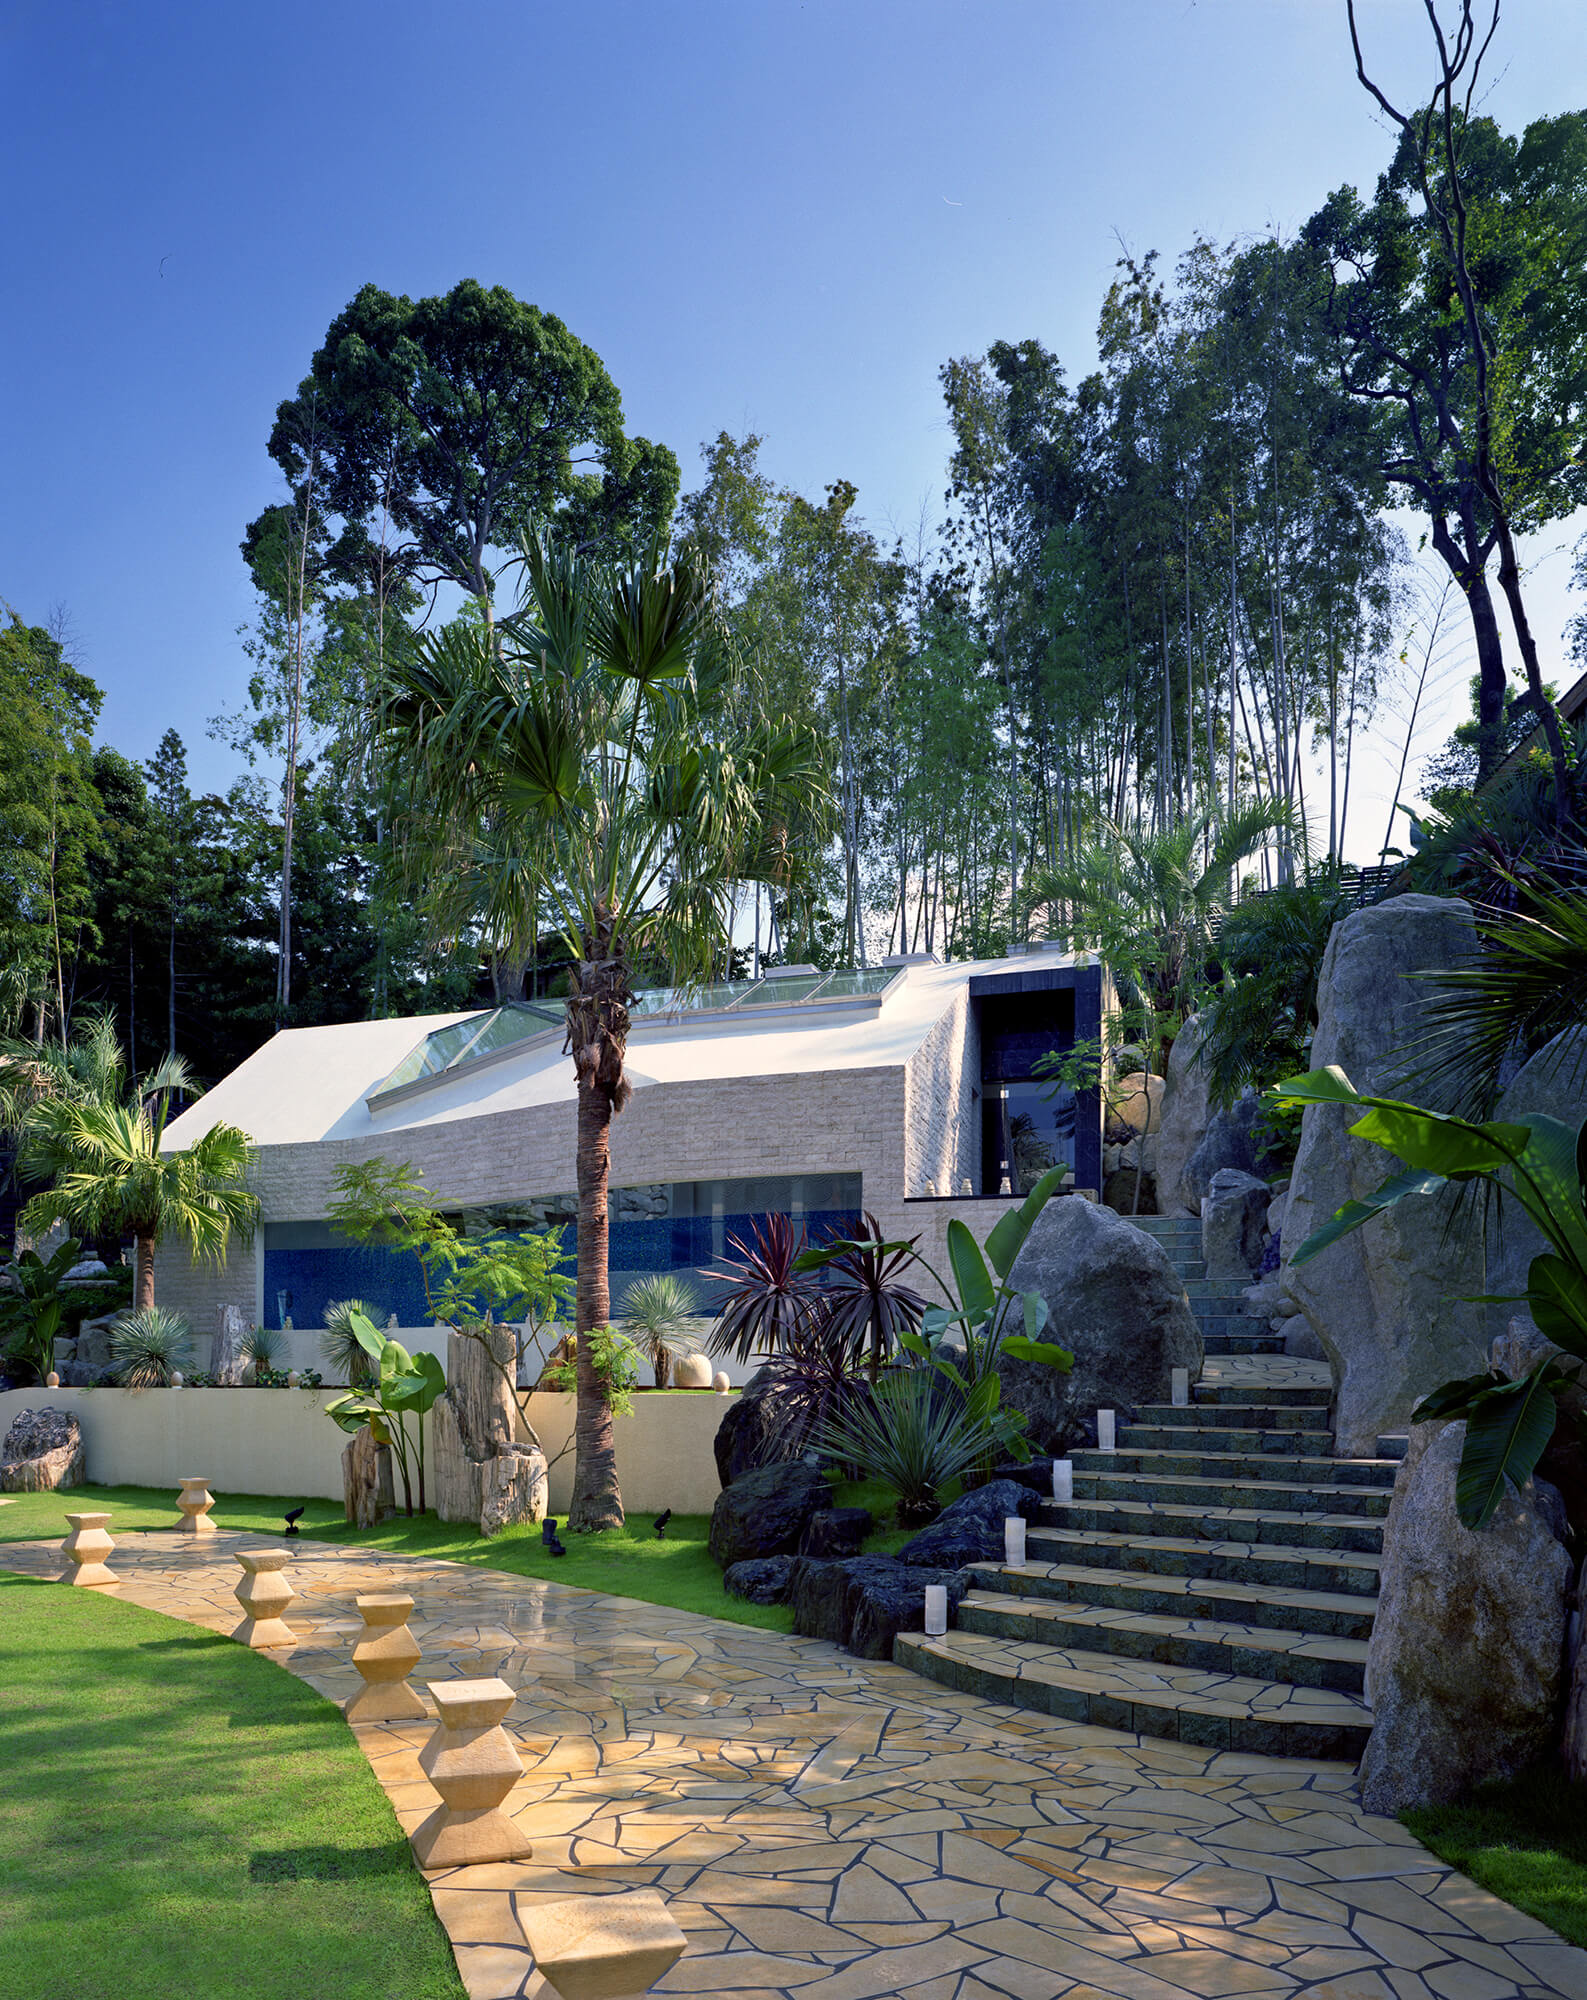 『桜坂の家』-福岡県福岡市-建築写真・竣工写真・インテリア写真3